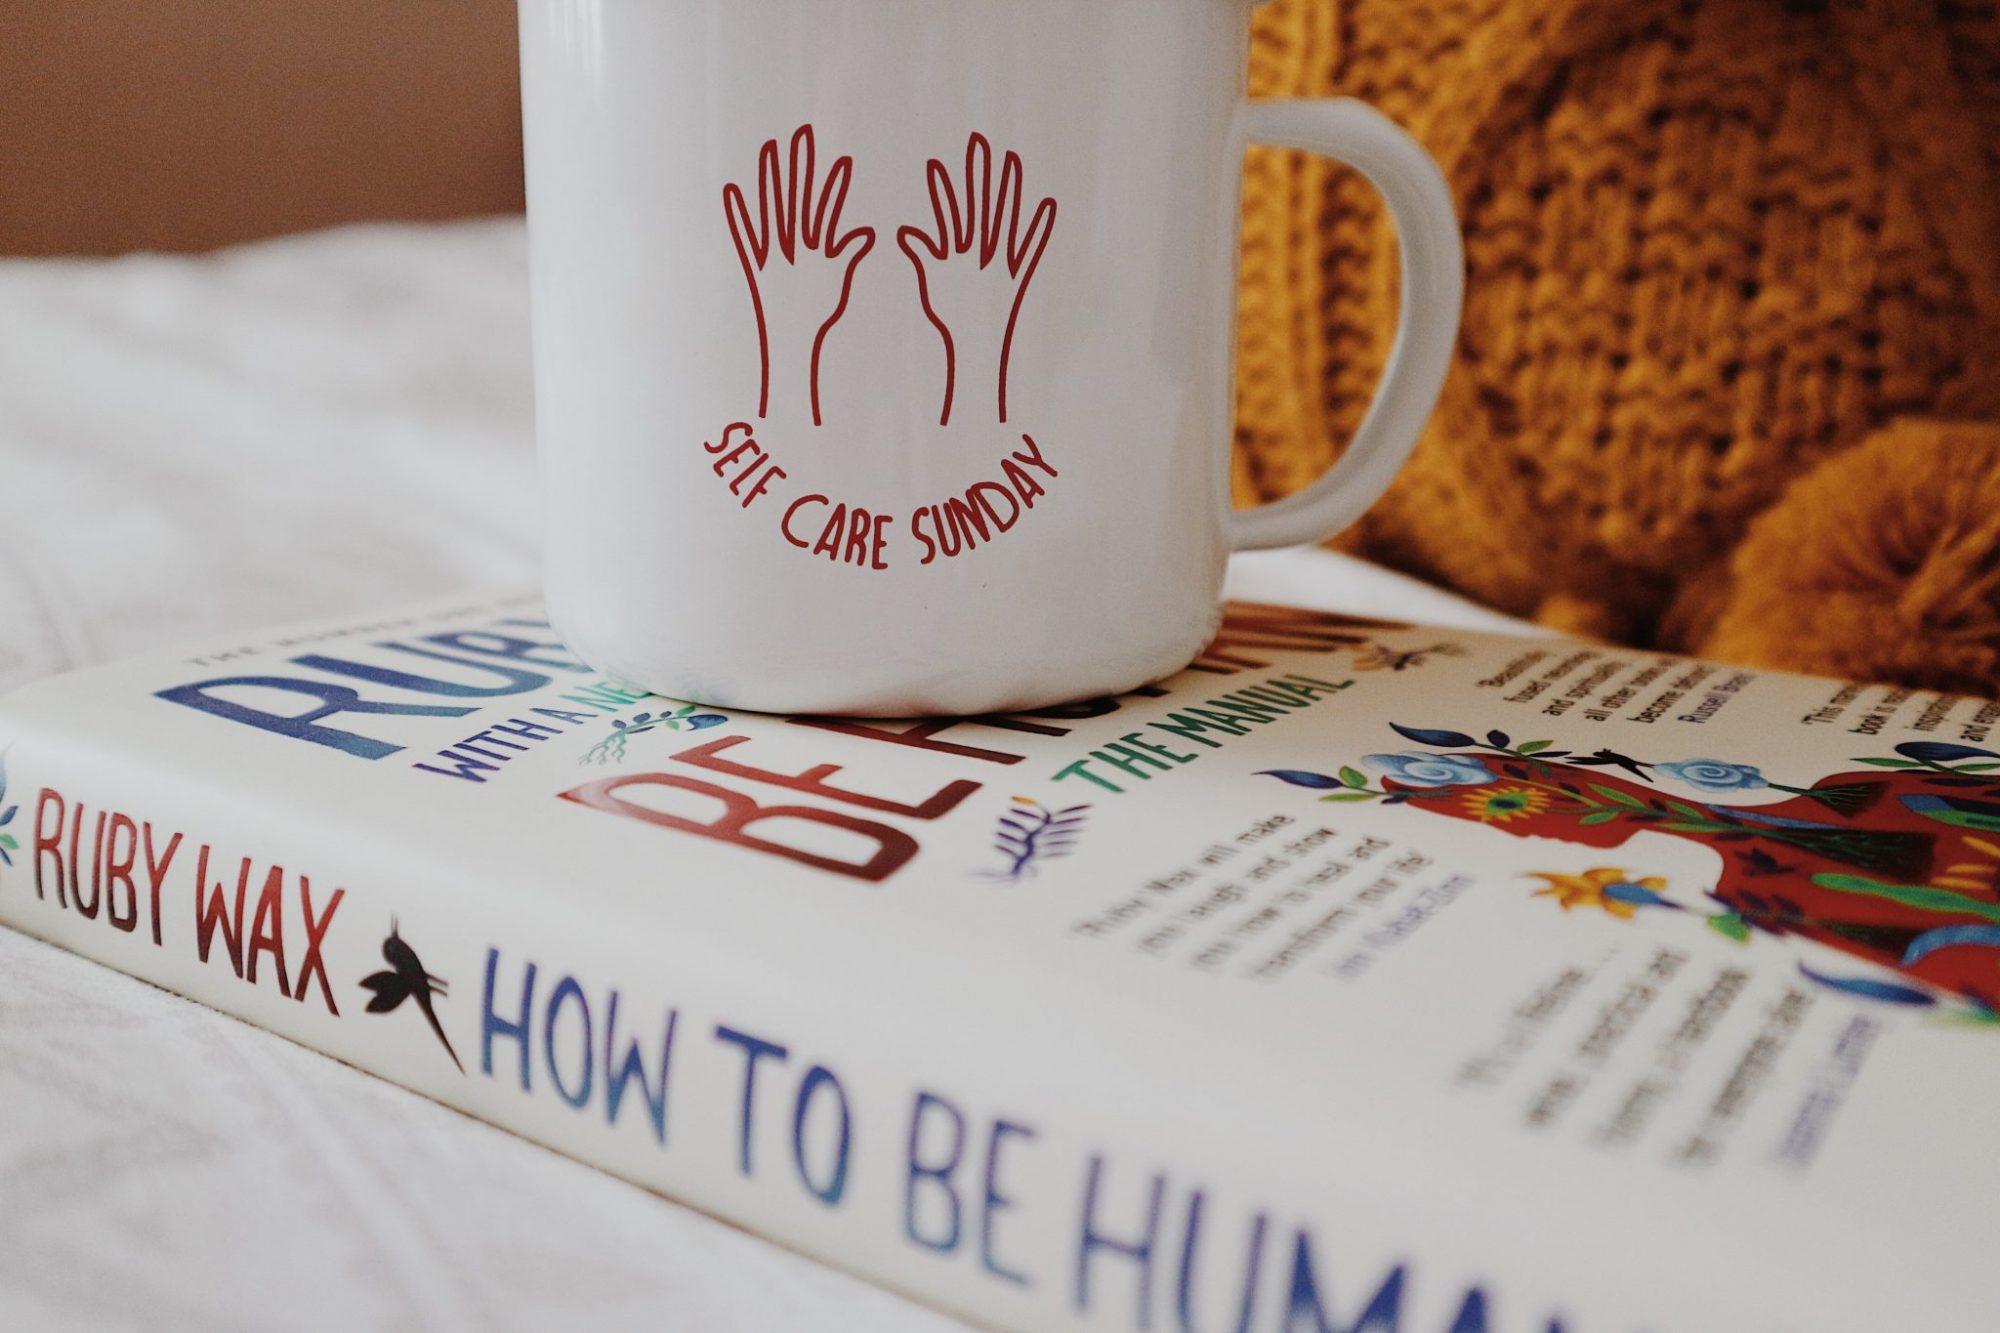 Self Care Sunday Mug + How To Be Human by Ruby Wax Book